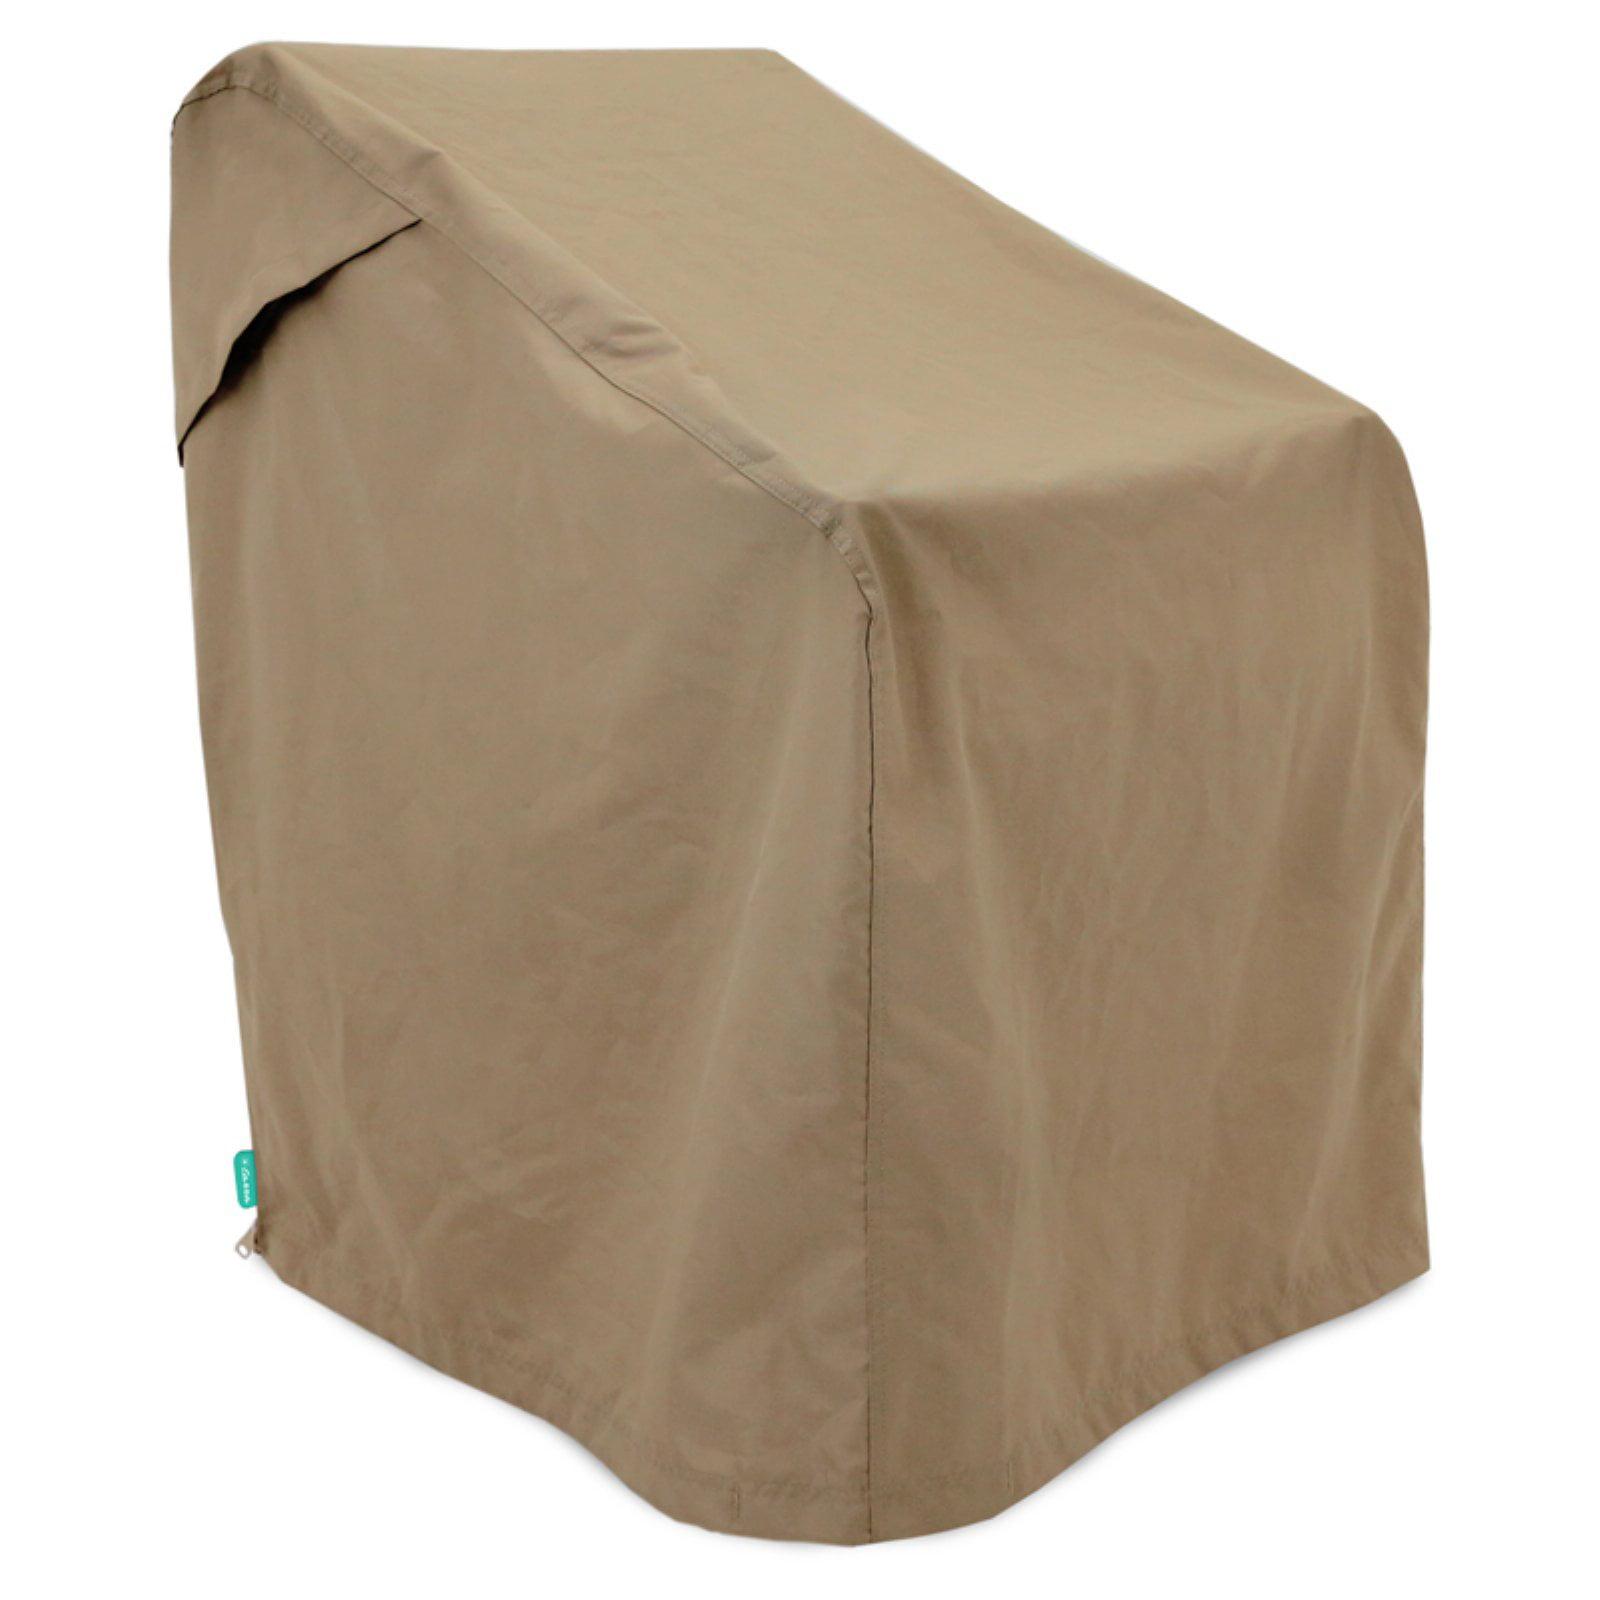 Tarra Home Universal Outdoor UFCCP263238PT Patio Chair Cover